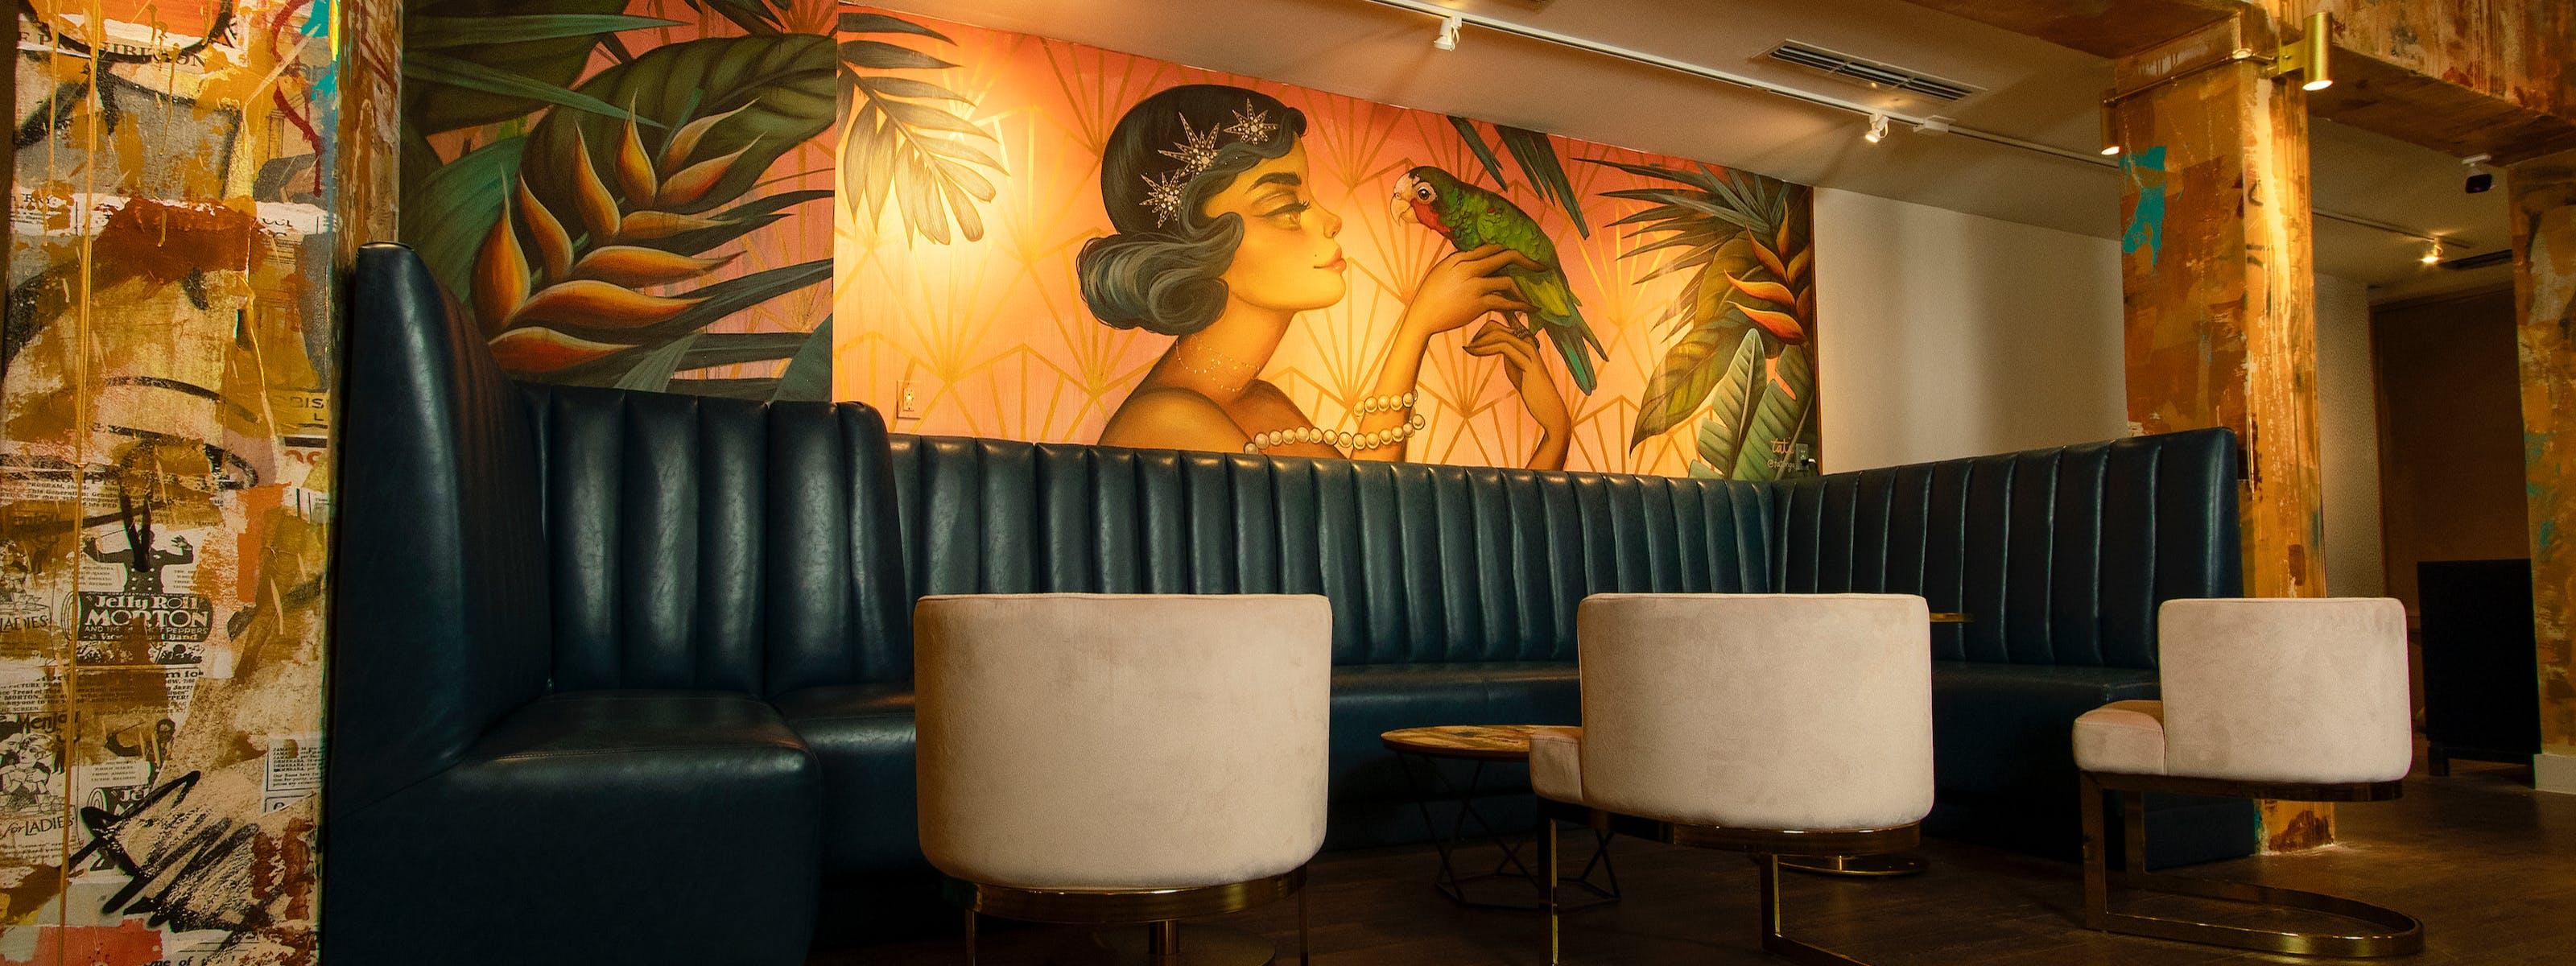 The Best Bars In Wynwood - Wynwood - Miami - The Infatuation